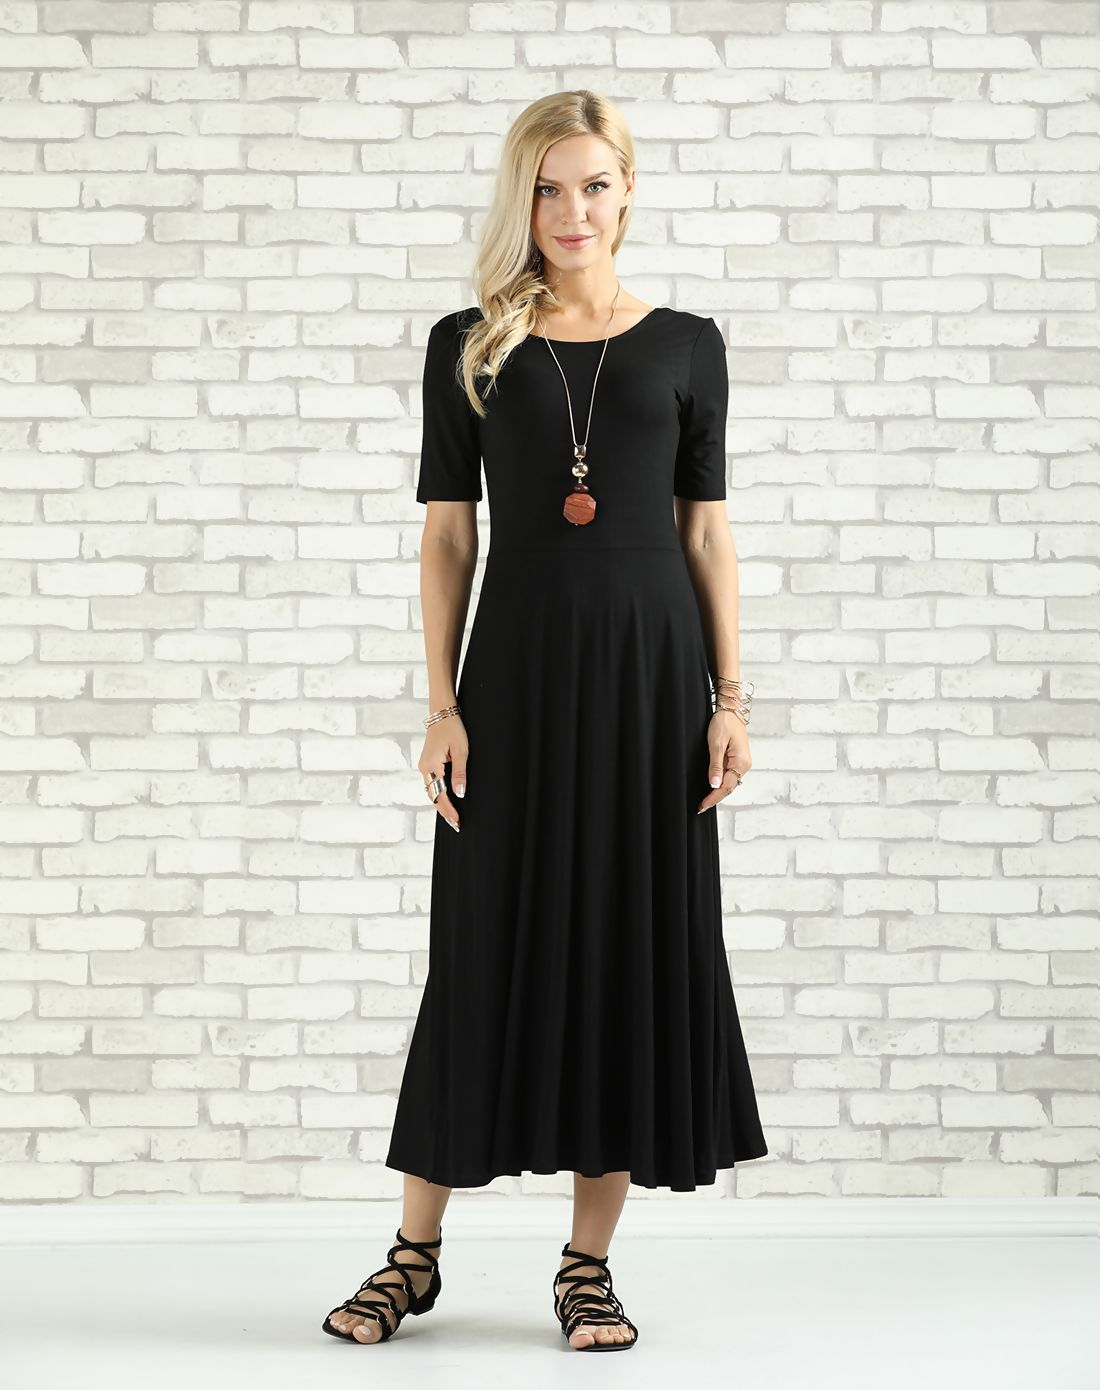 Adorewe vipme casual dressesdesigner suzanne betro black scoop